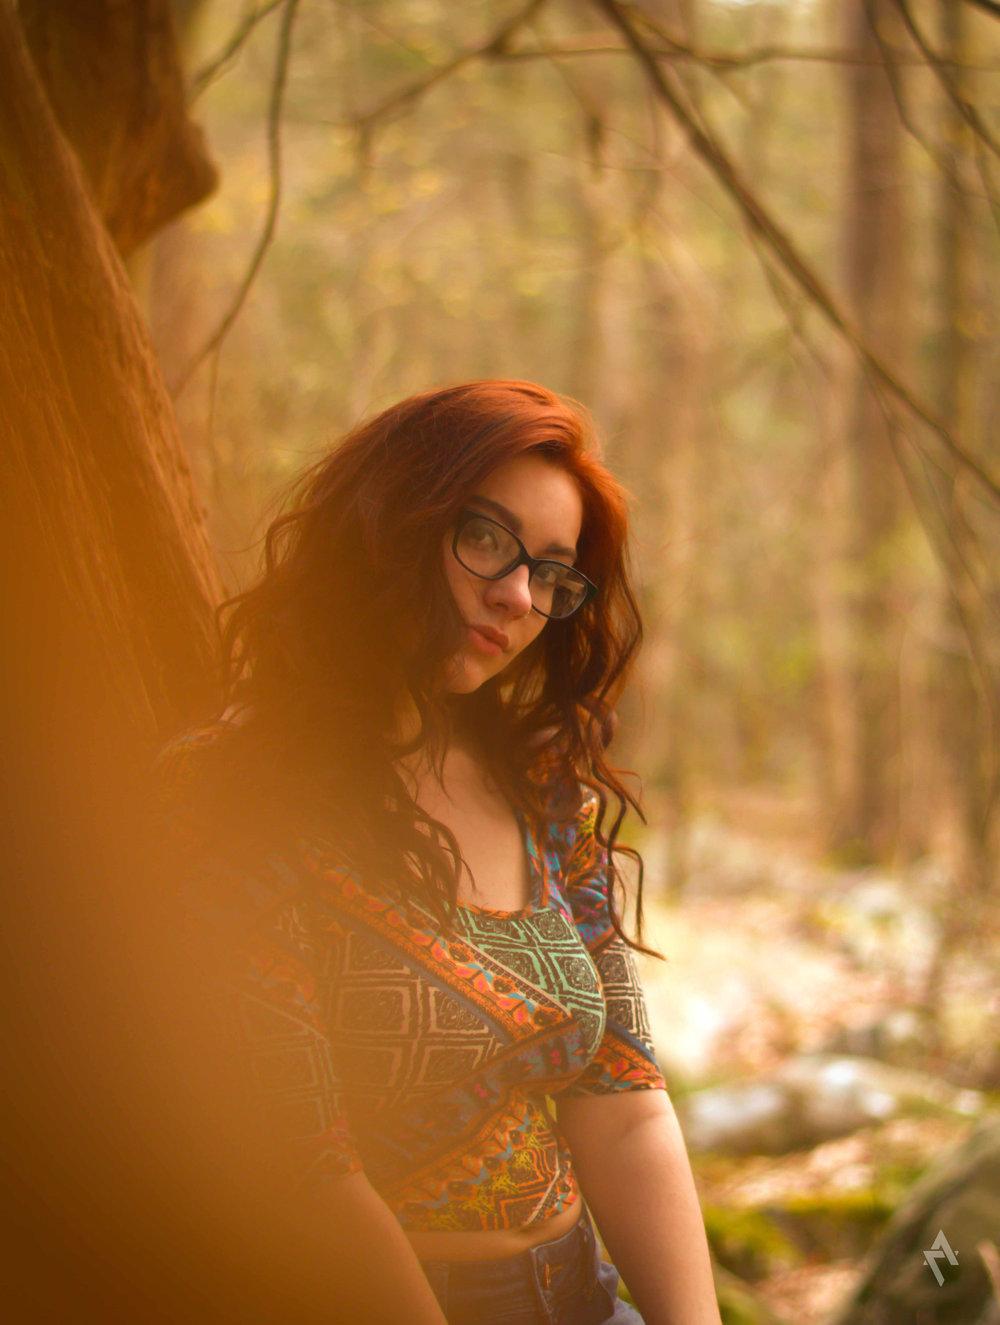 Lorna_portrait_photography_ligonier_pa_warmcolors_beauty_2.jpg